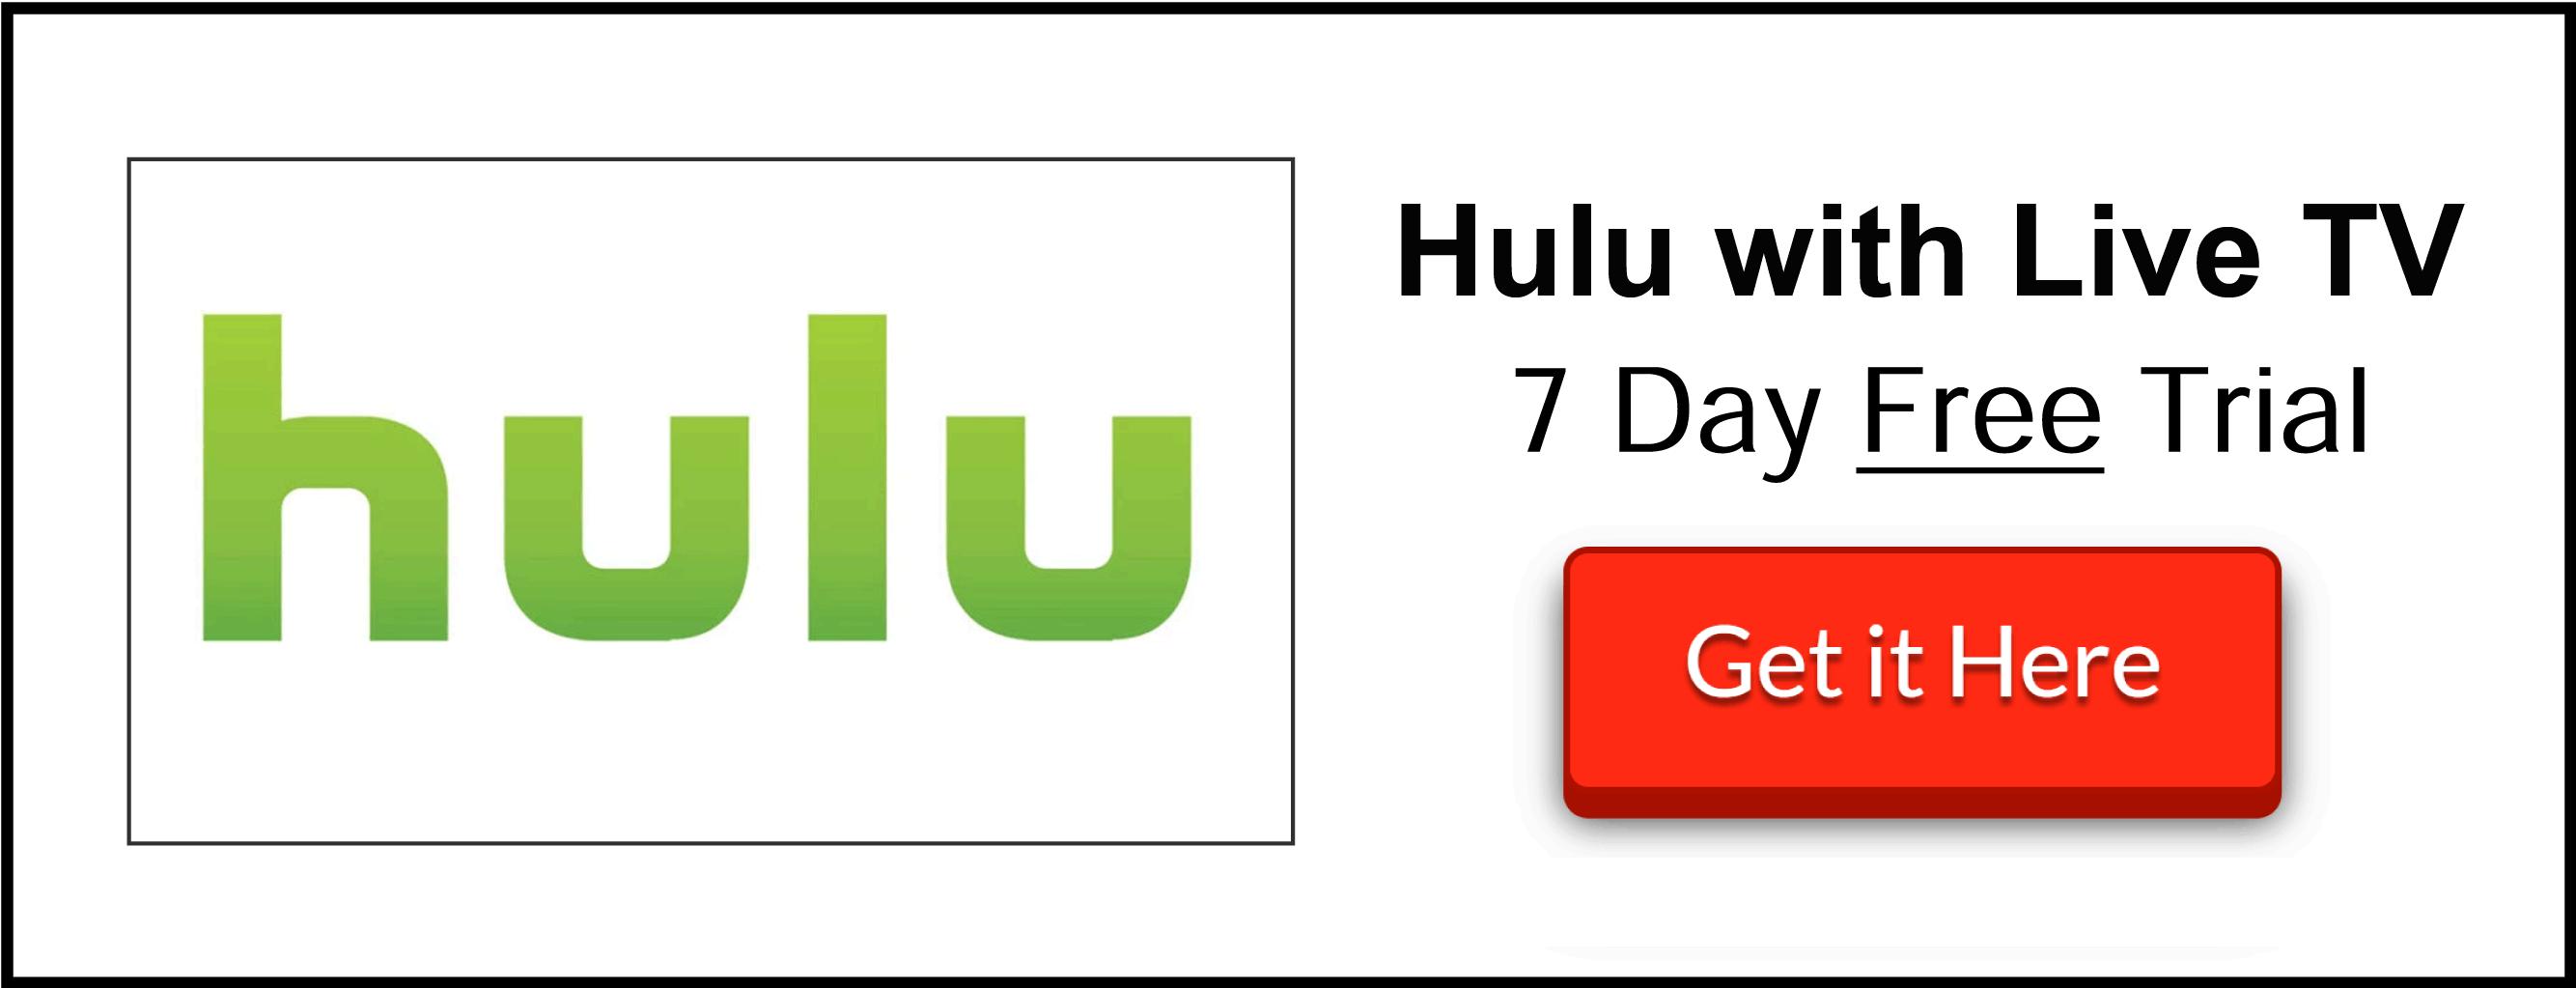 hulu-live-tv-free-trial-offer